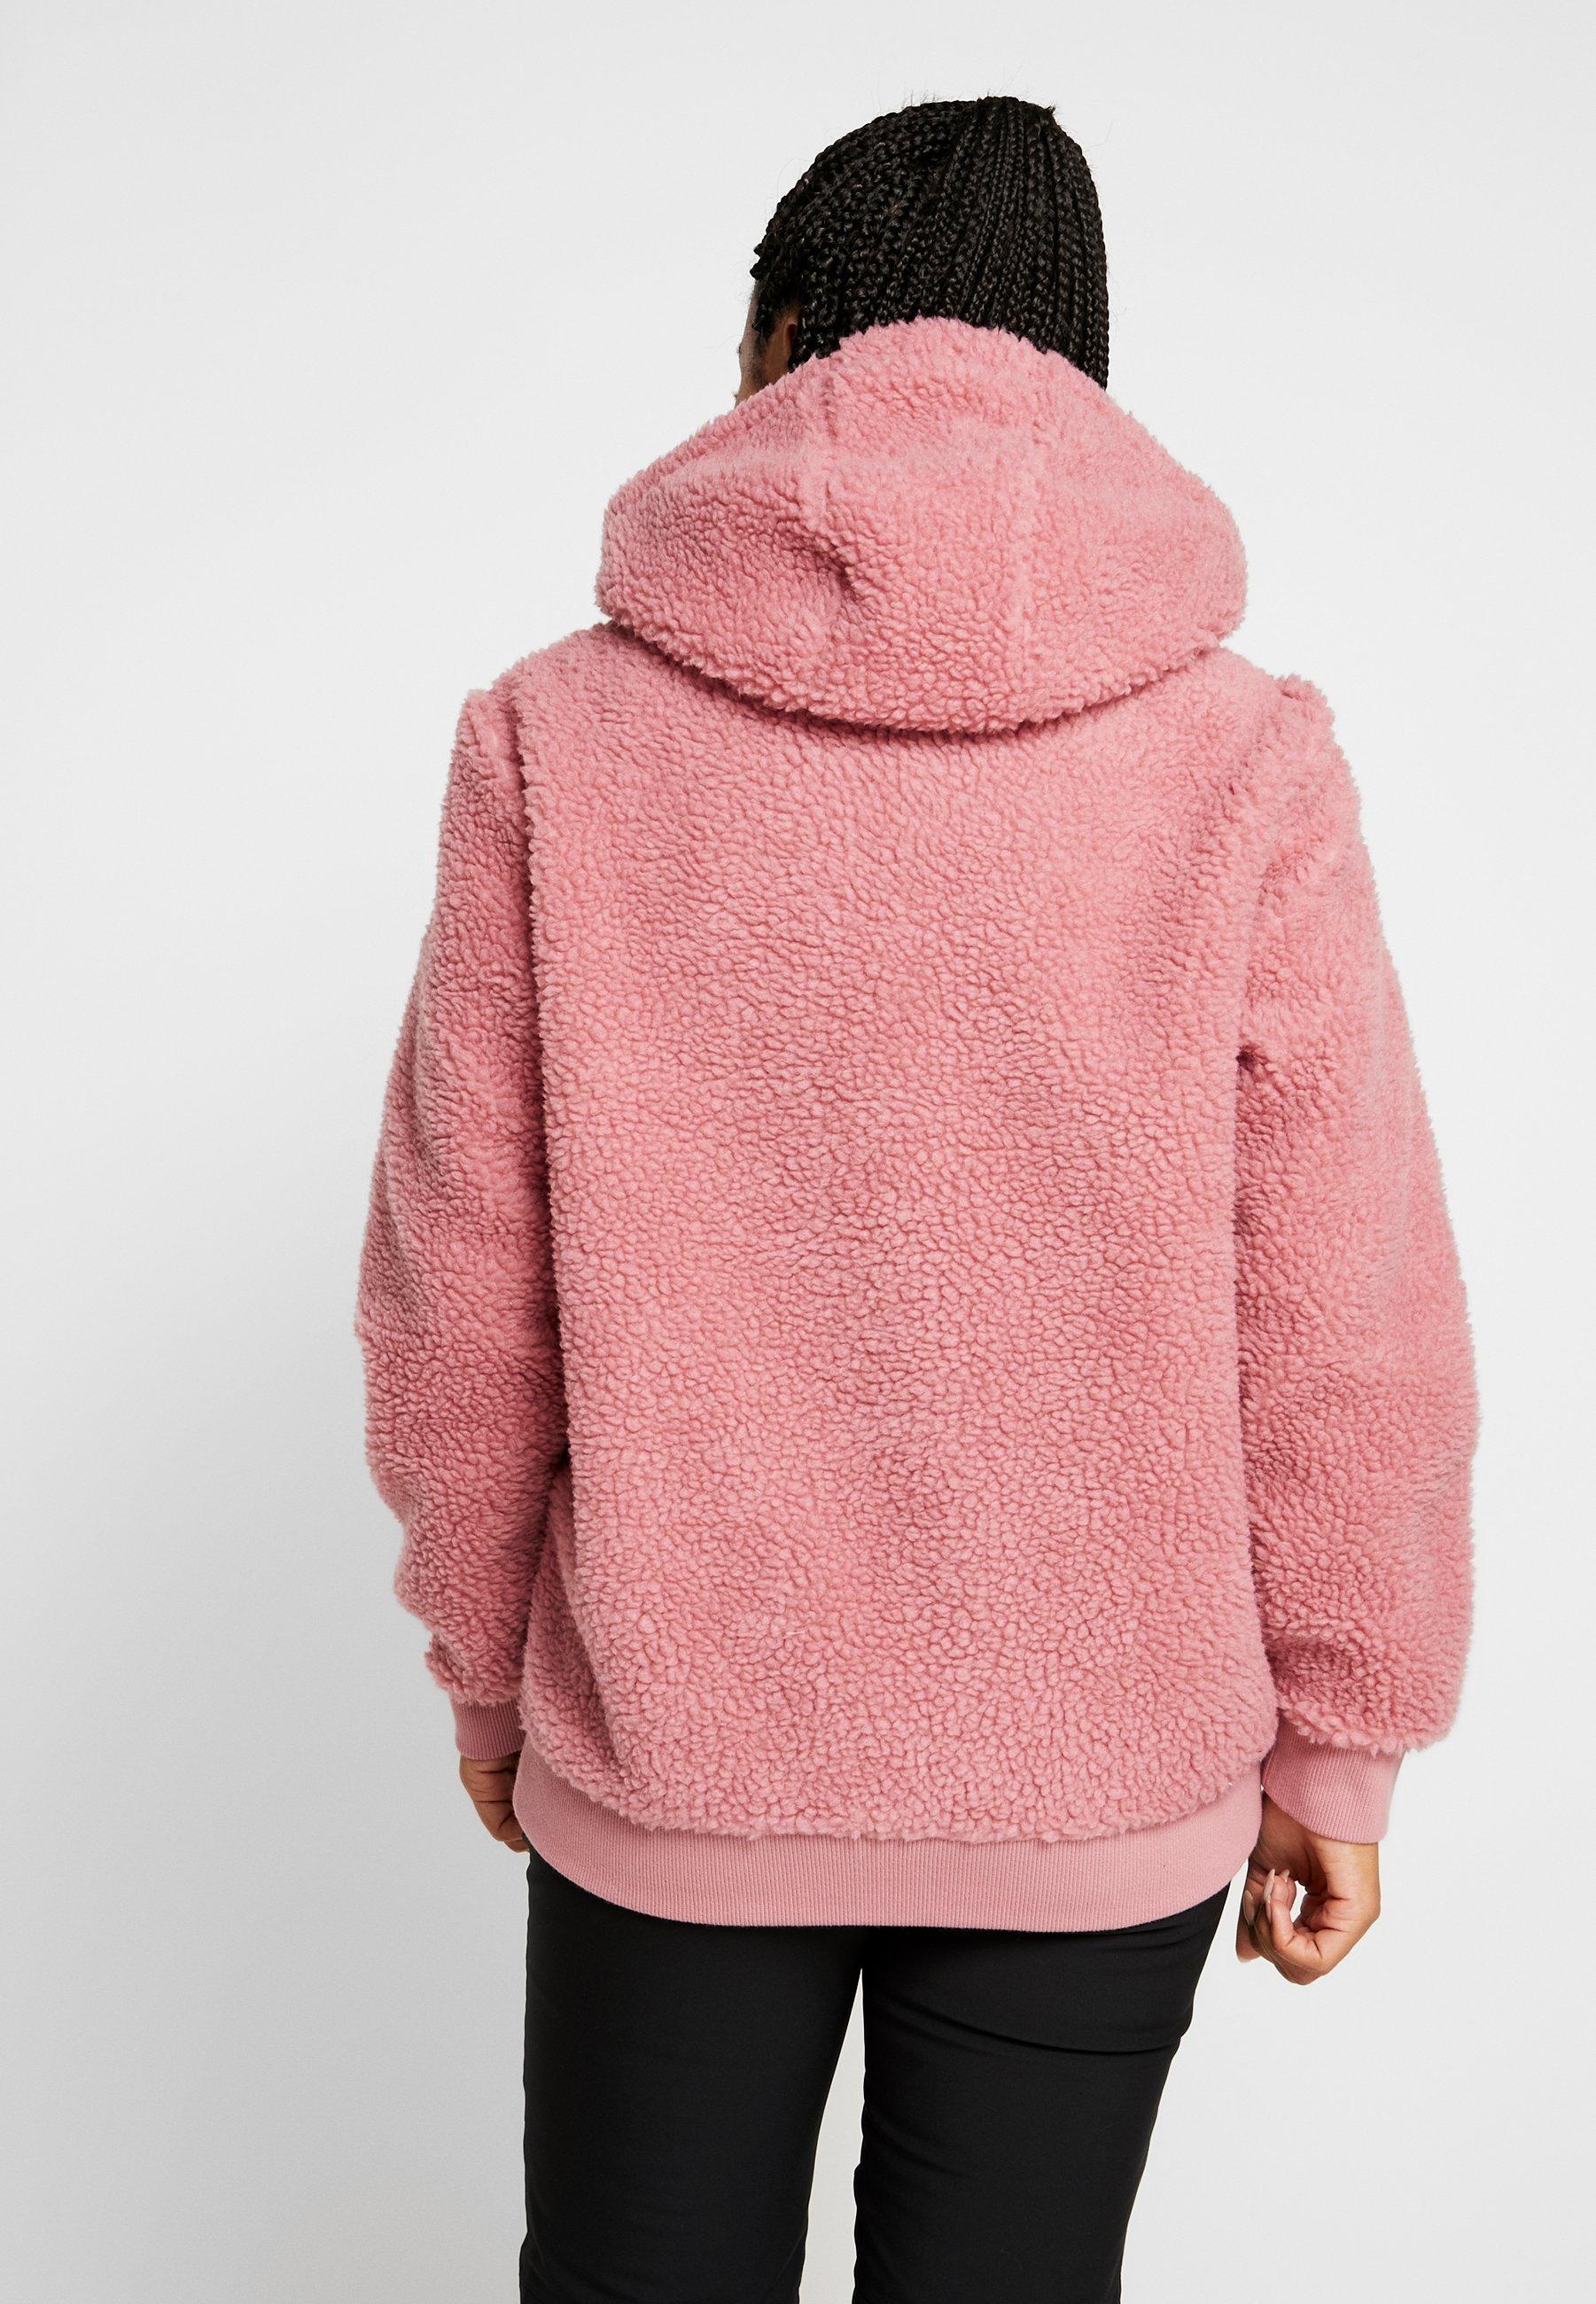 Napapijri Teide Hoody trui dames pink blush Truien